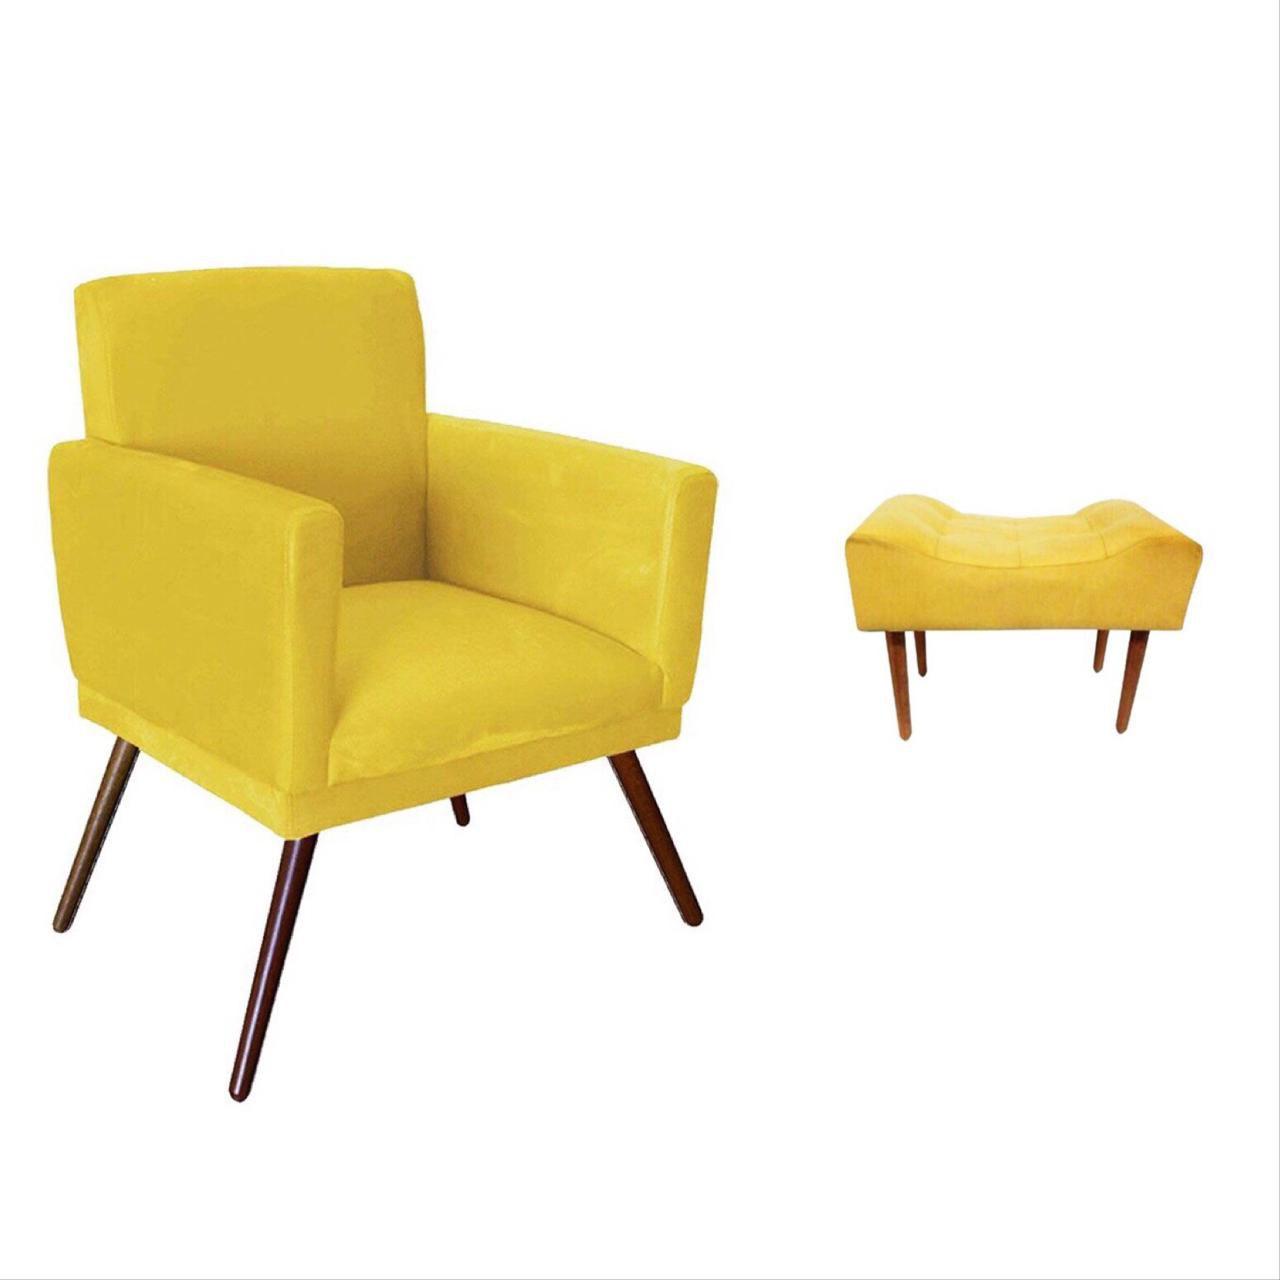 Kit Poltrona Decorativa Nina com rodapé e Puff retangular Amarelo - Bela Casa Shop